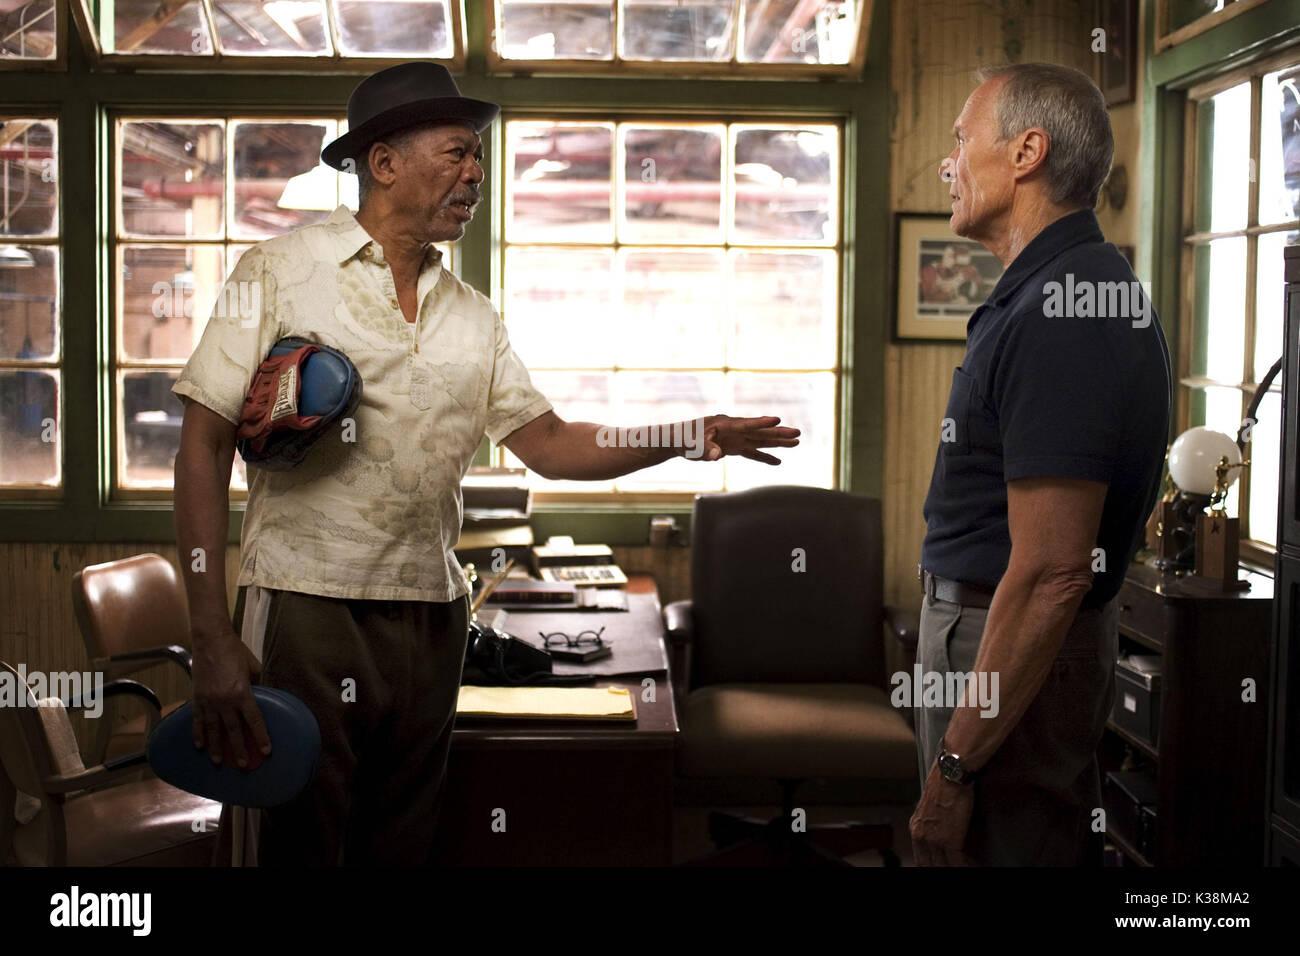 Morgan Freeman Clint Stock Photos & Morgan Freeman Clint Stock